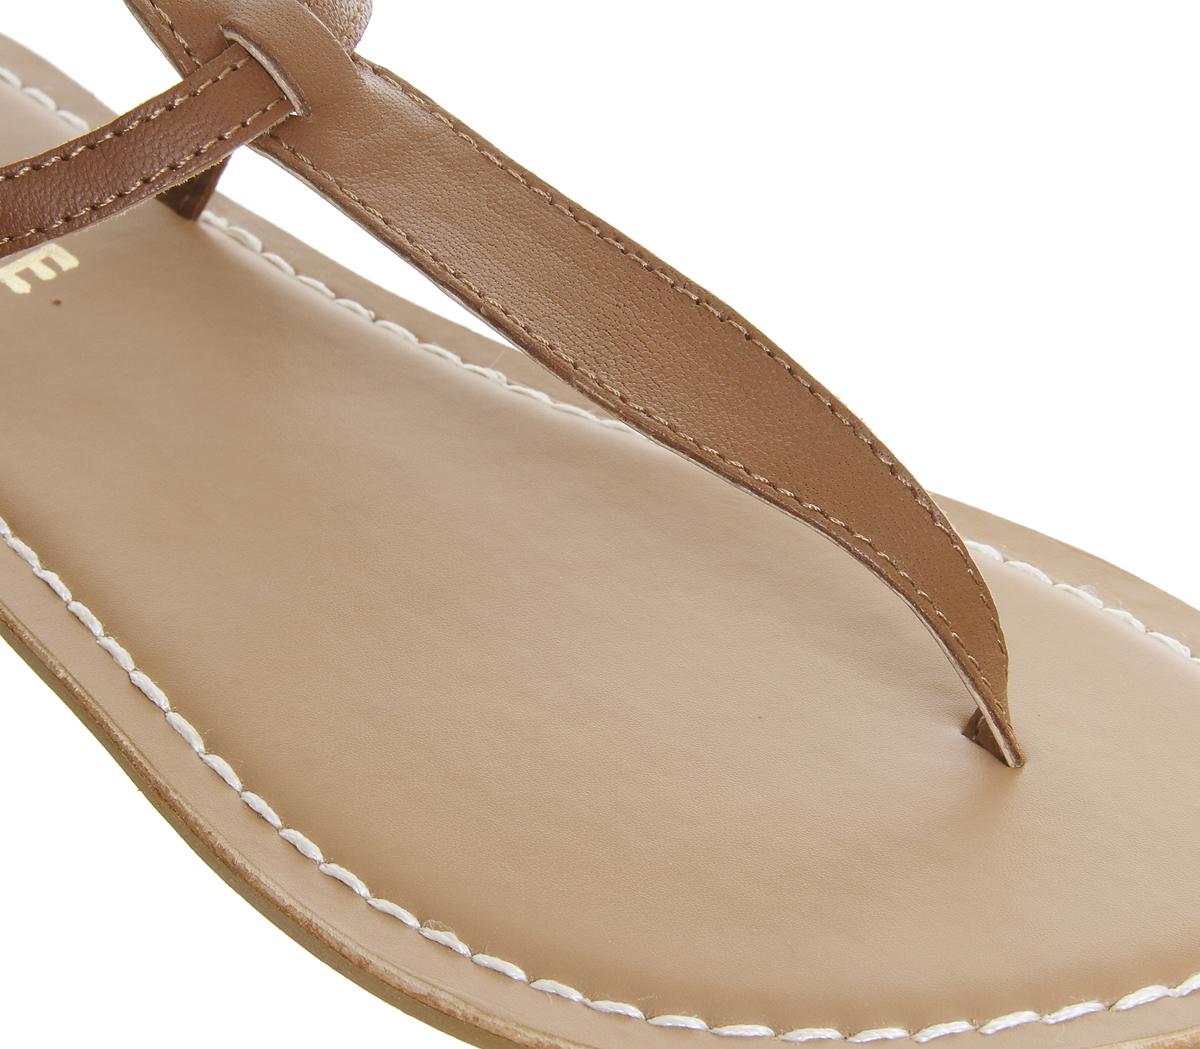 d41f6552bef6 Womens Office Samba Toe Post Sandals Tan Leather Sandals